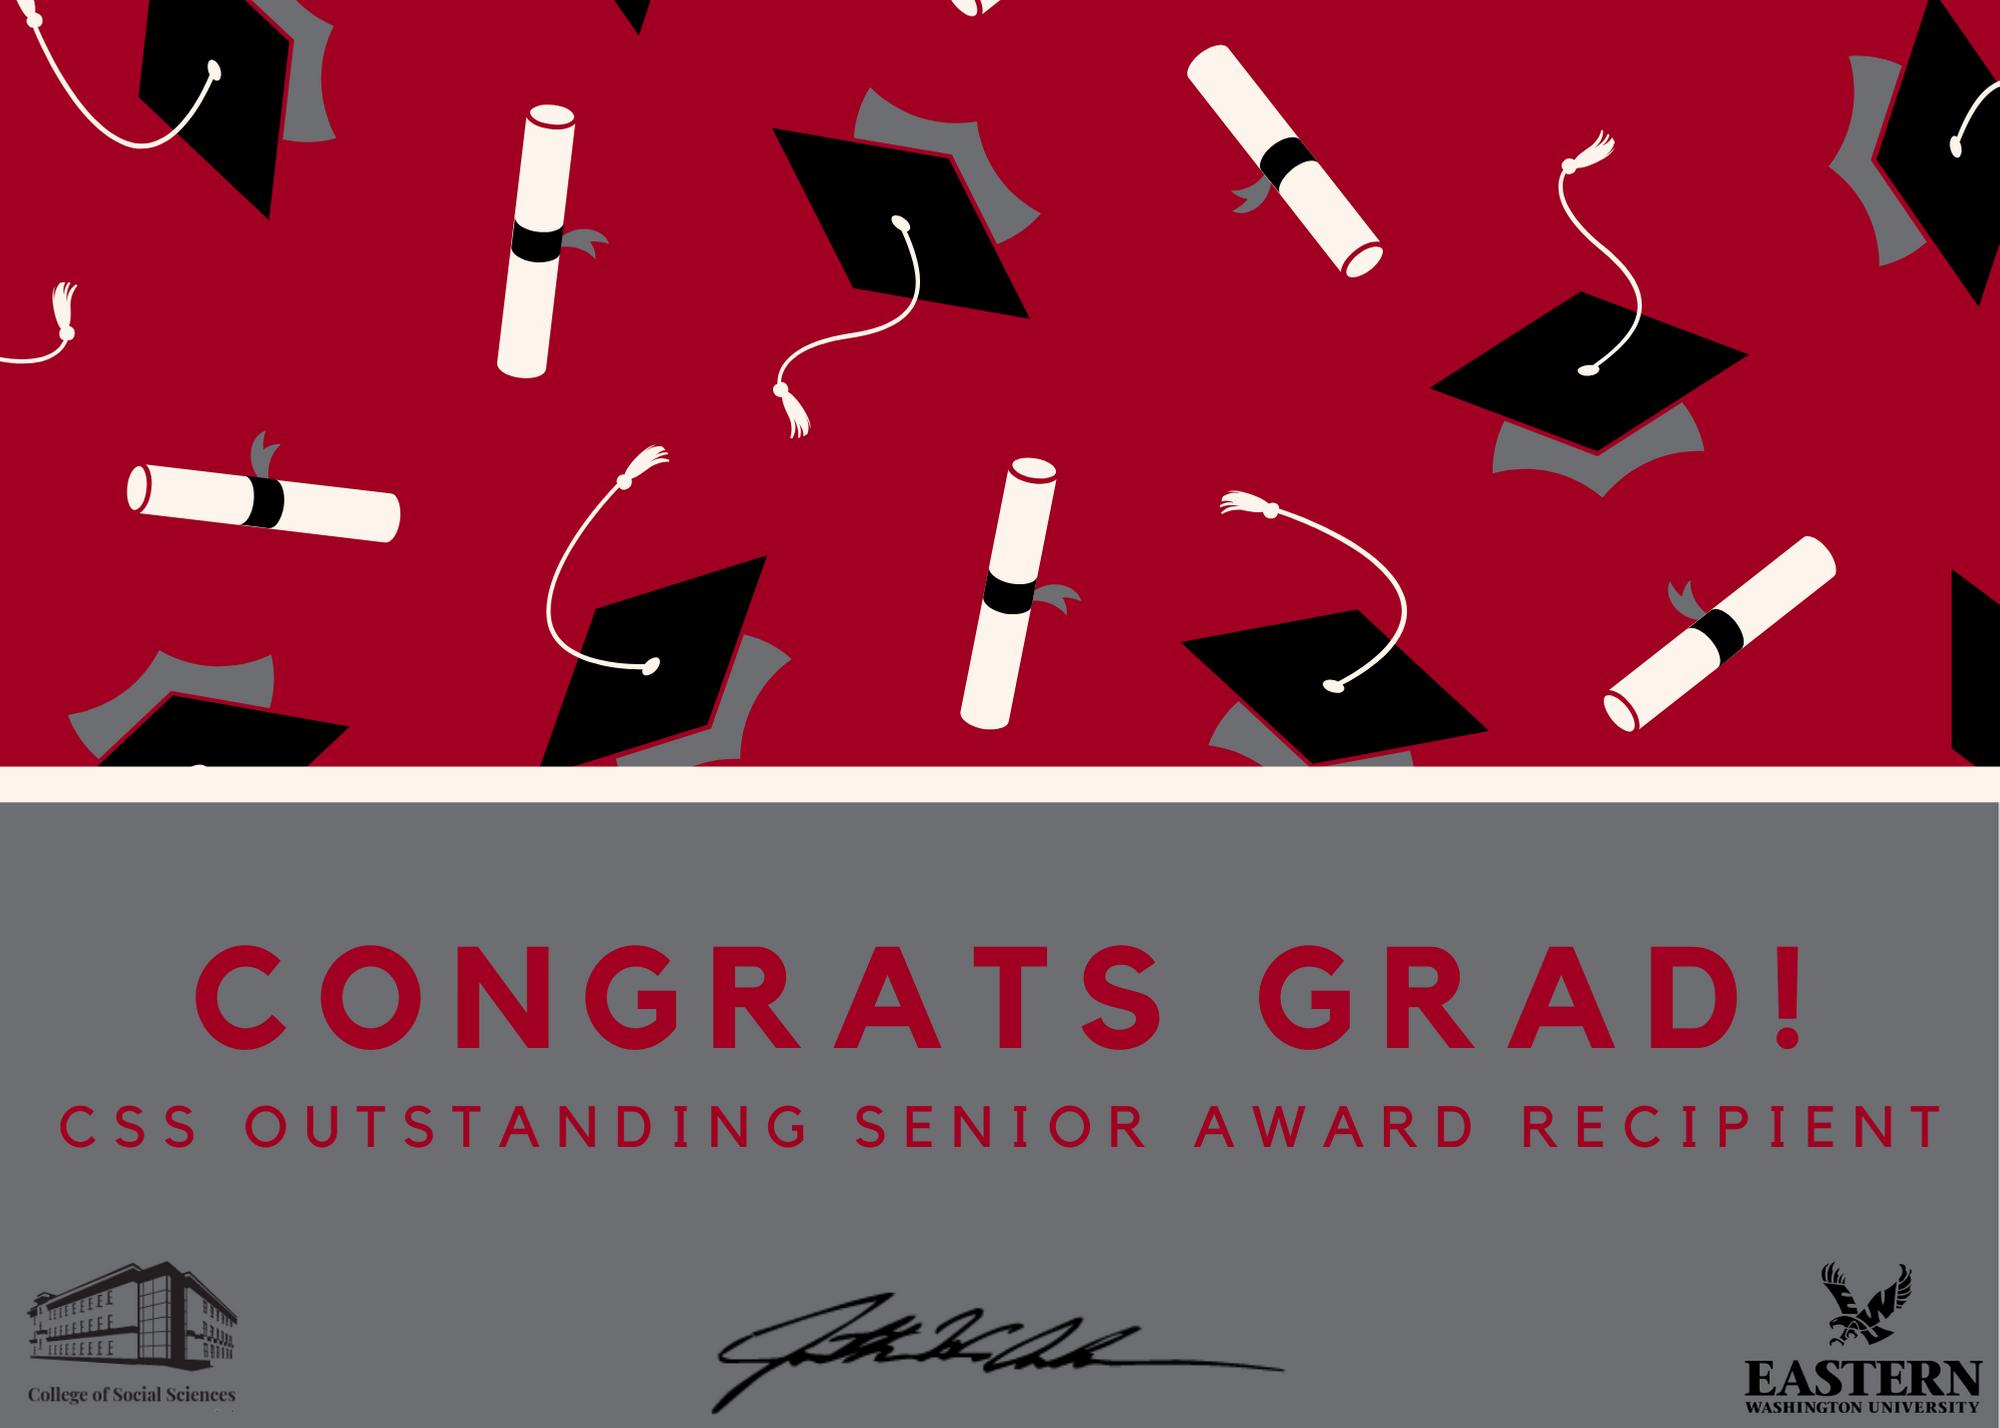 4149-caps-and-diplomas-pattern-graduation-card-2.png